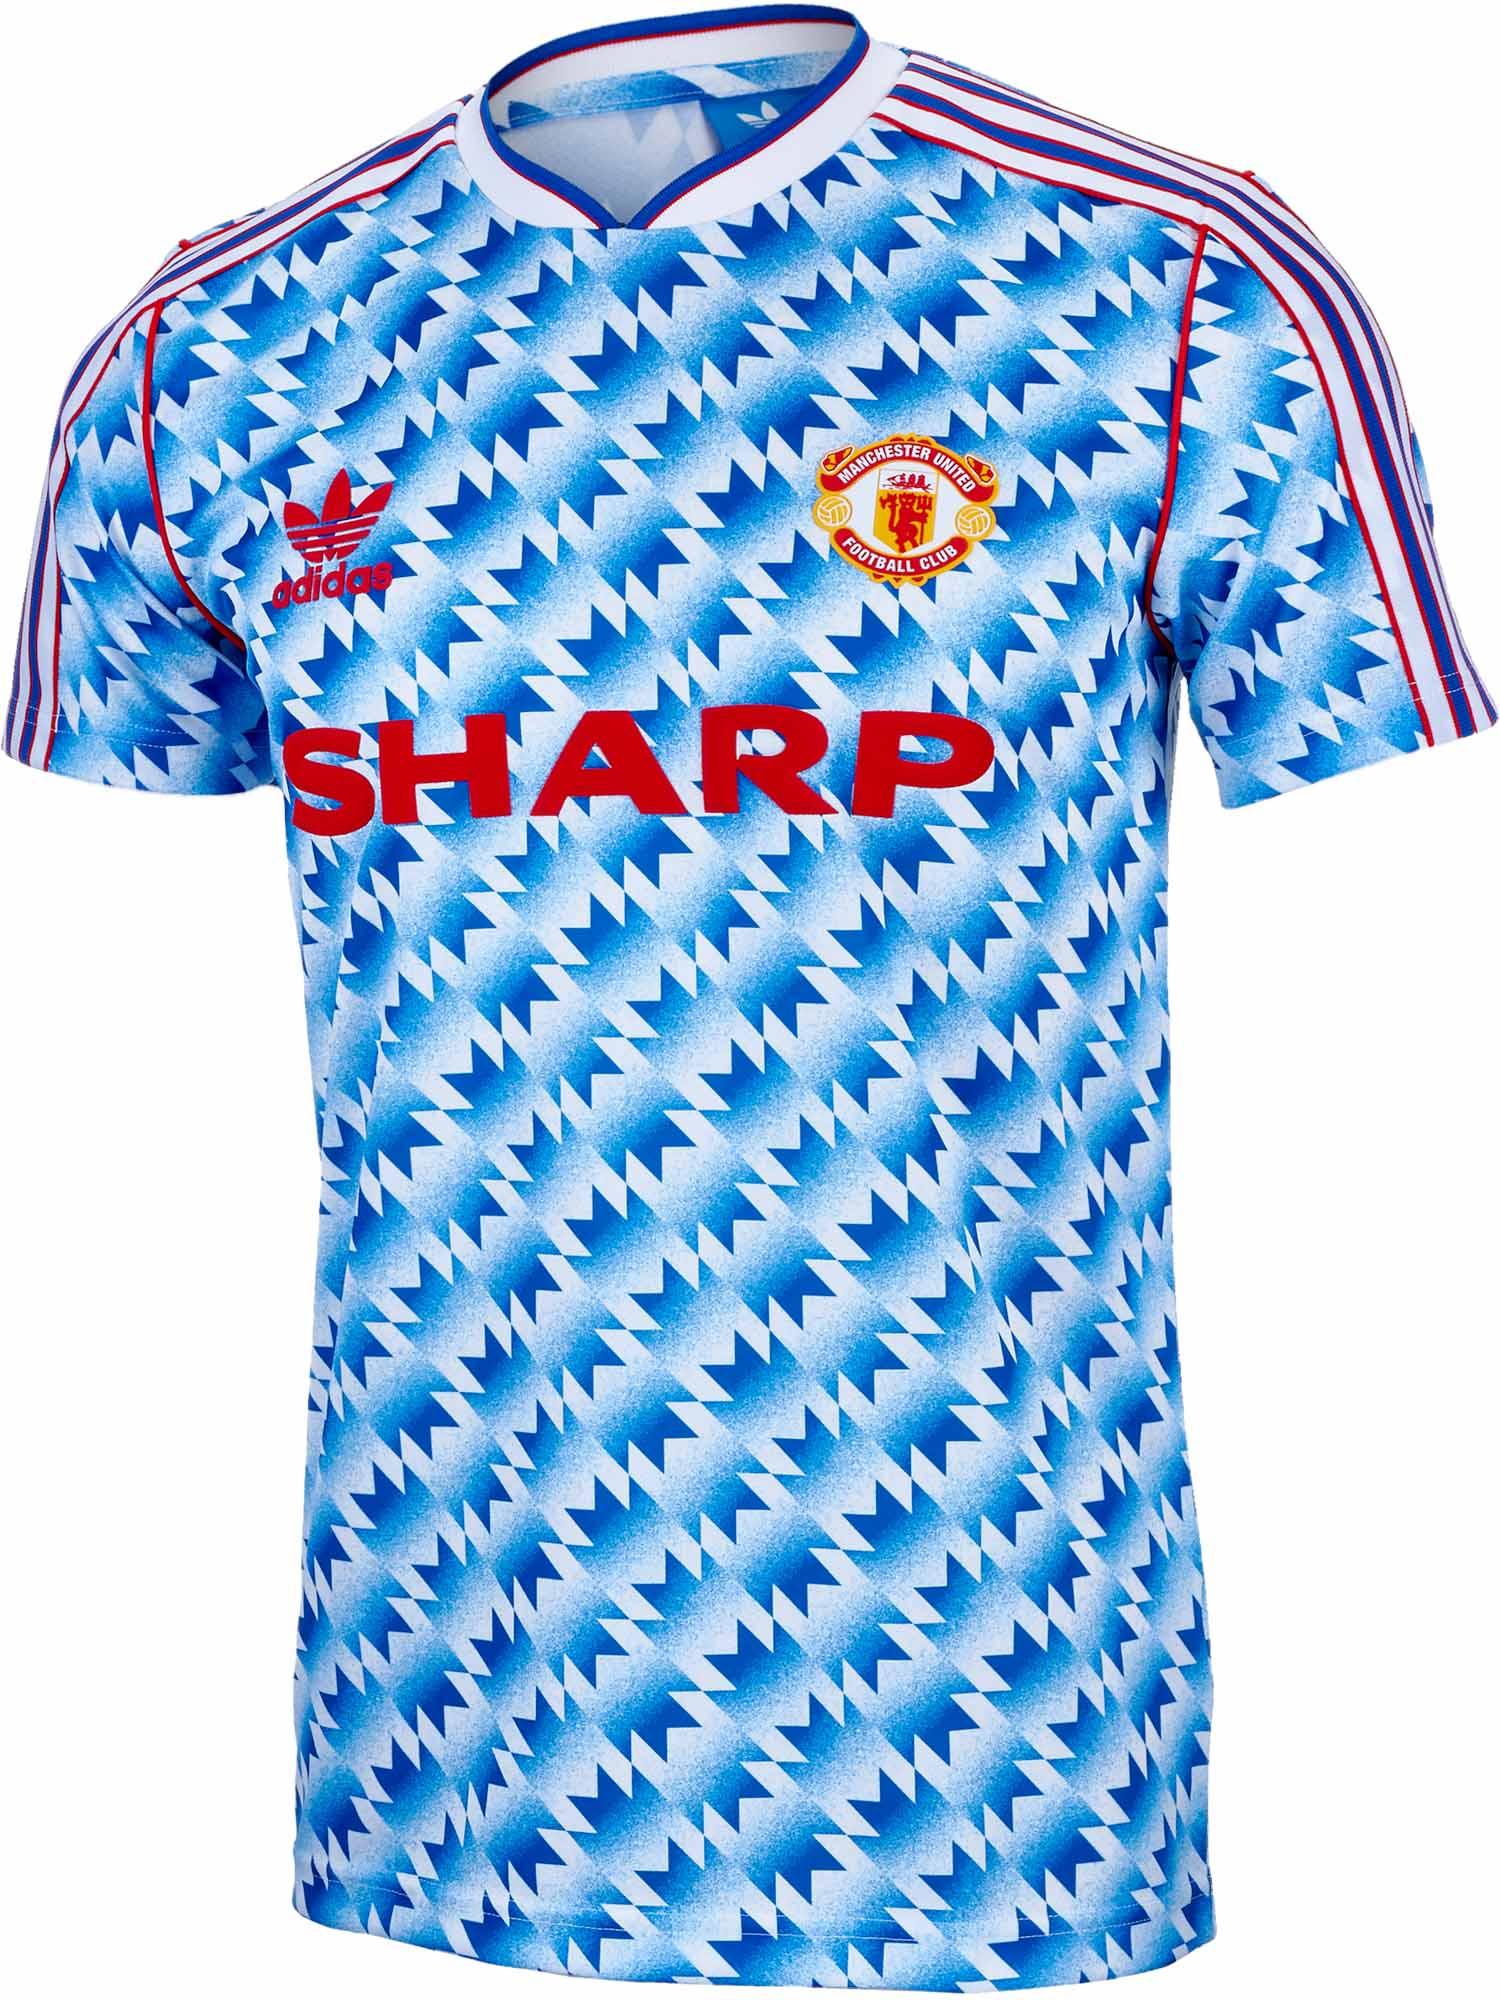 96d5d014d Man Utd Retro Shirts - DREAMWORKS